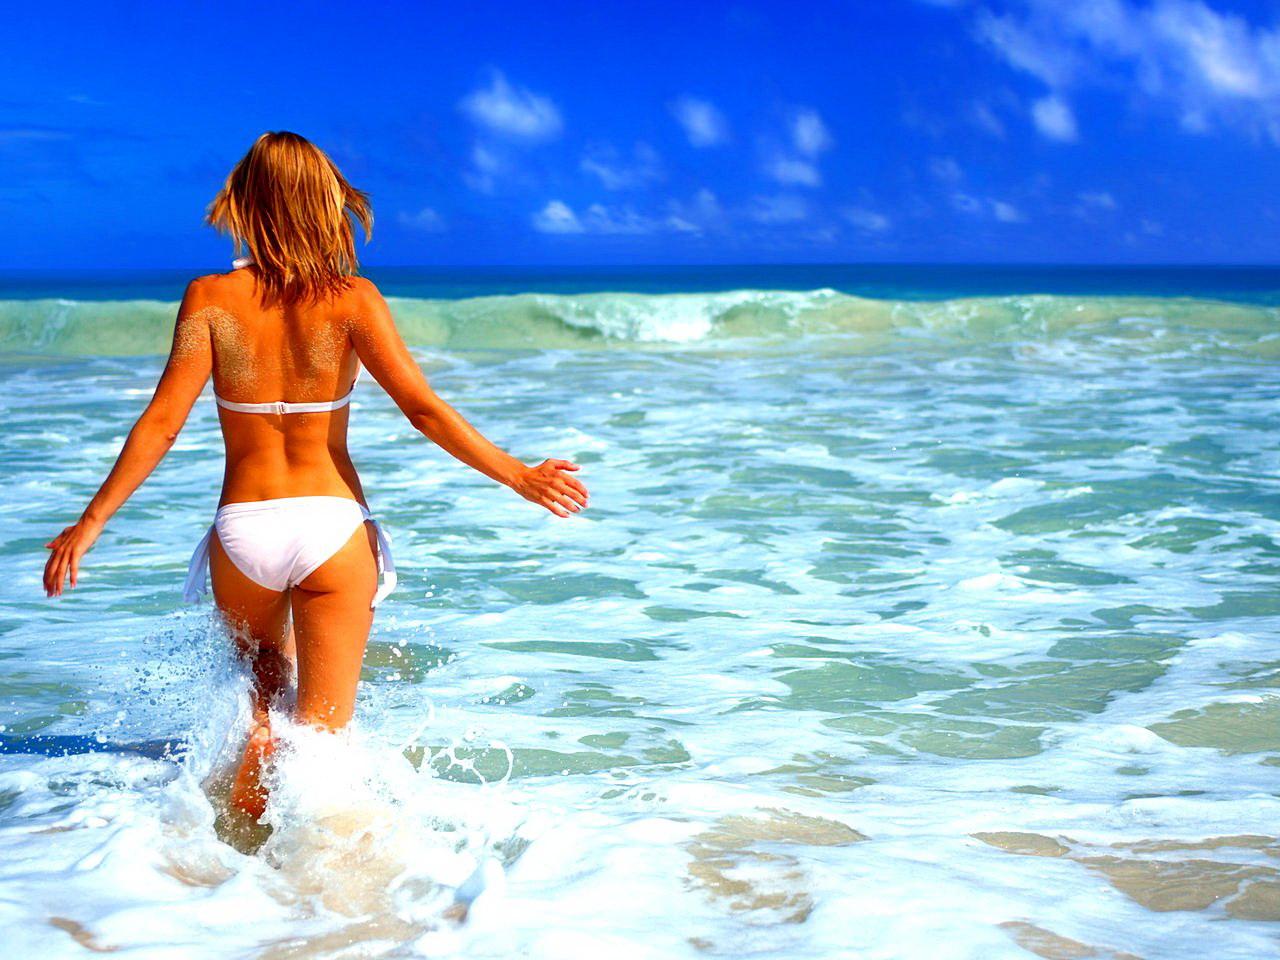 Фото девки на море 3 фотография